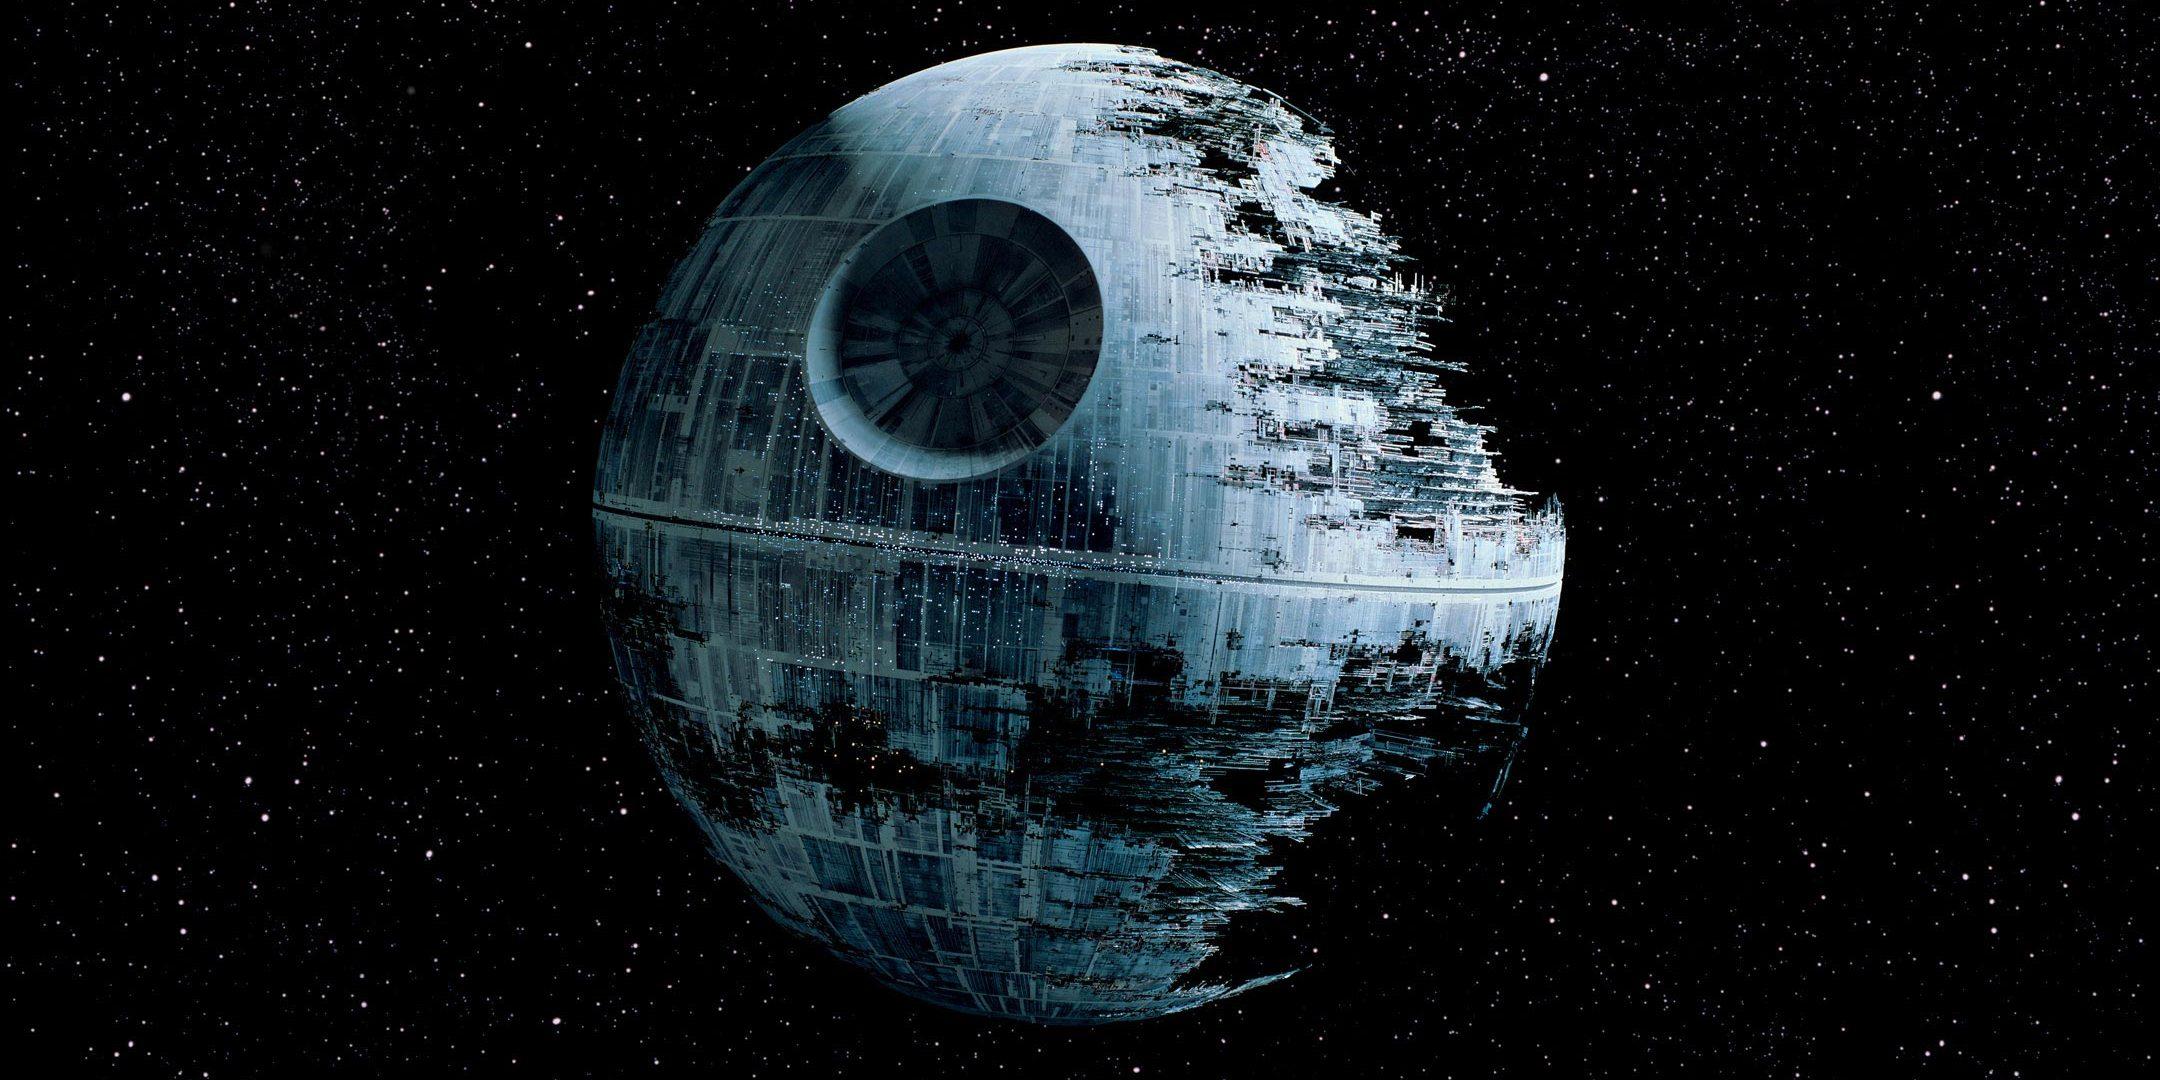 #1 The Death Star, Star Wars